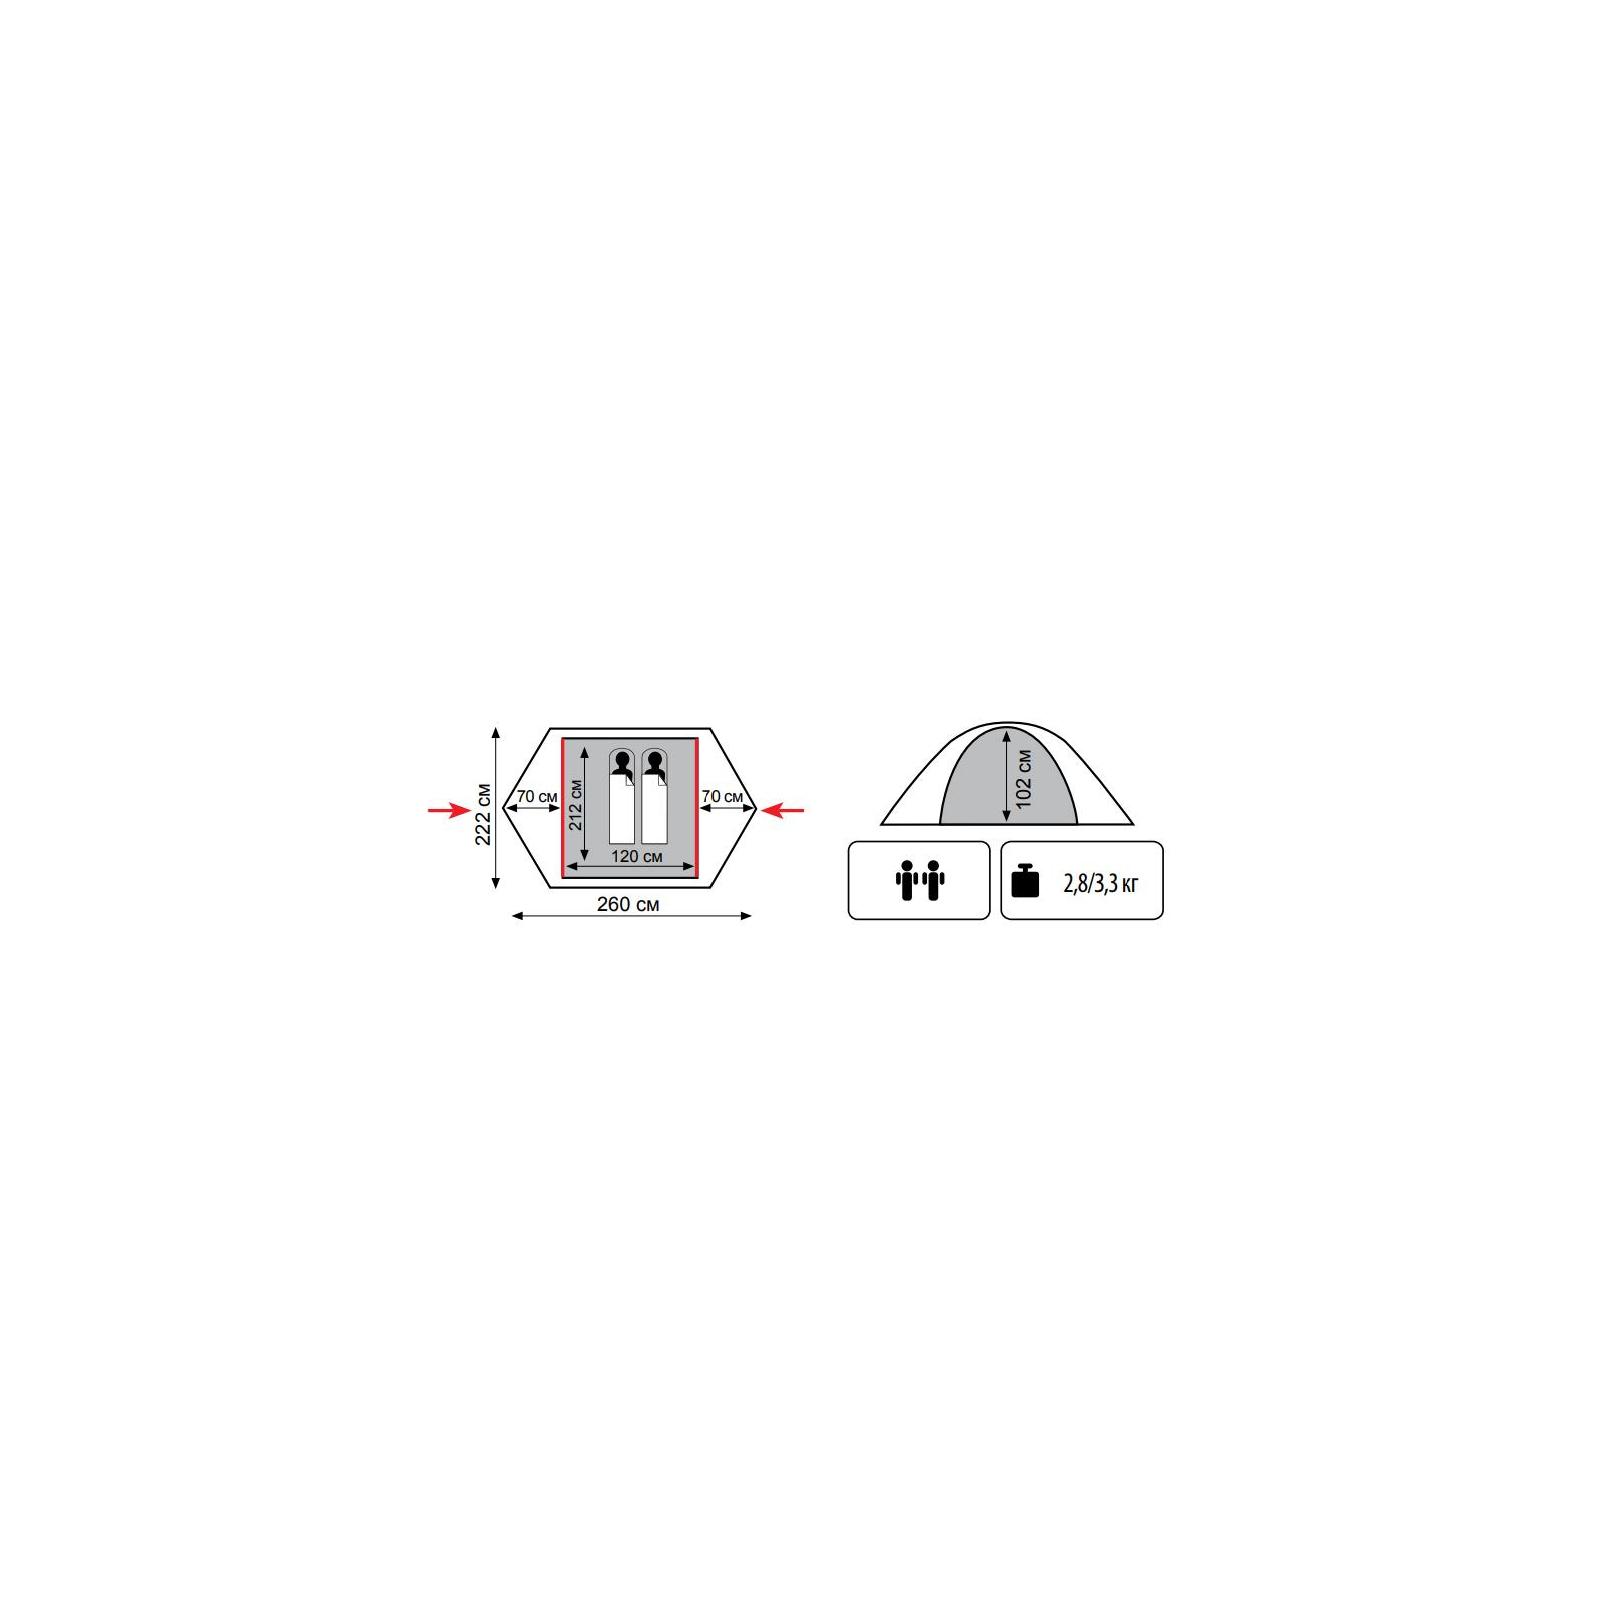 Палатка Tramp Colibri v2 (TRT-034) изображение 2